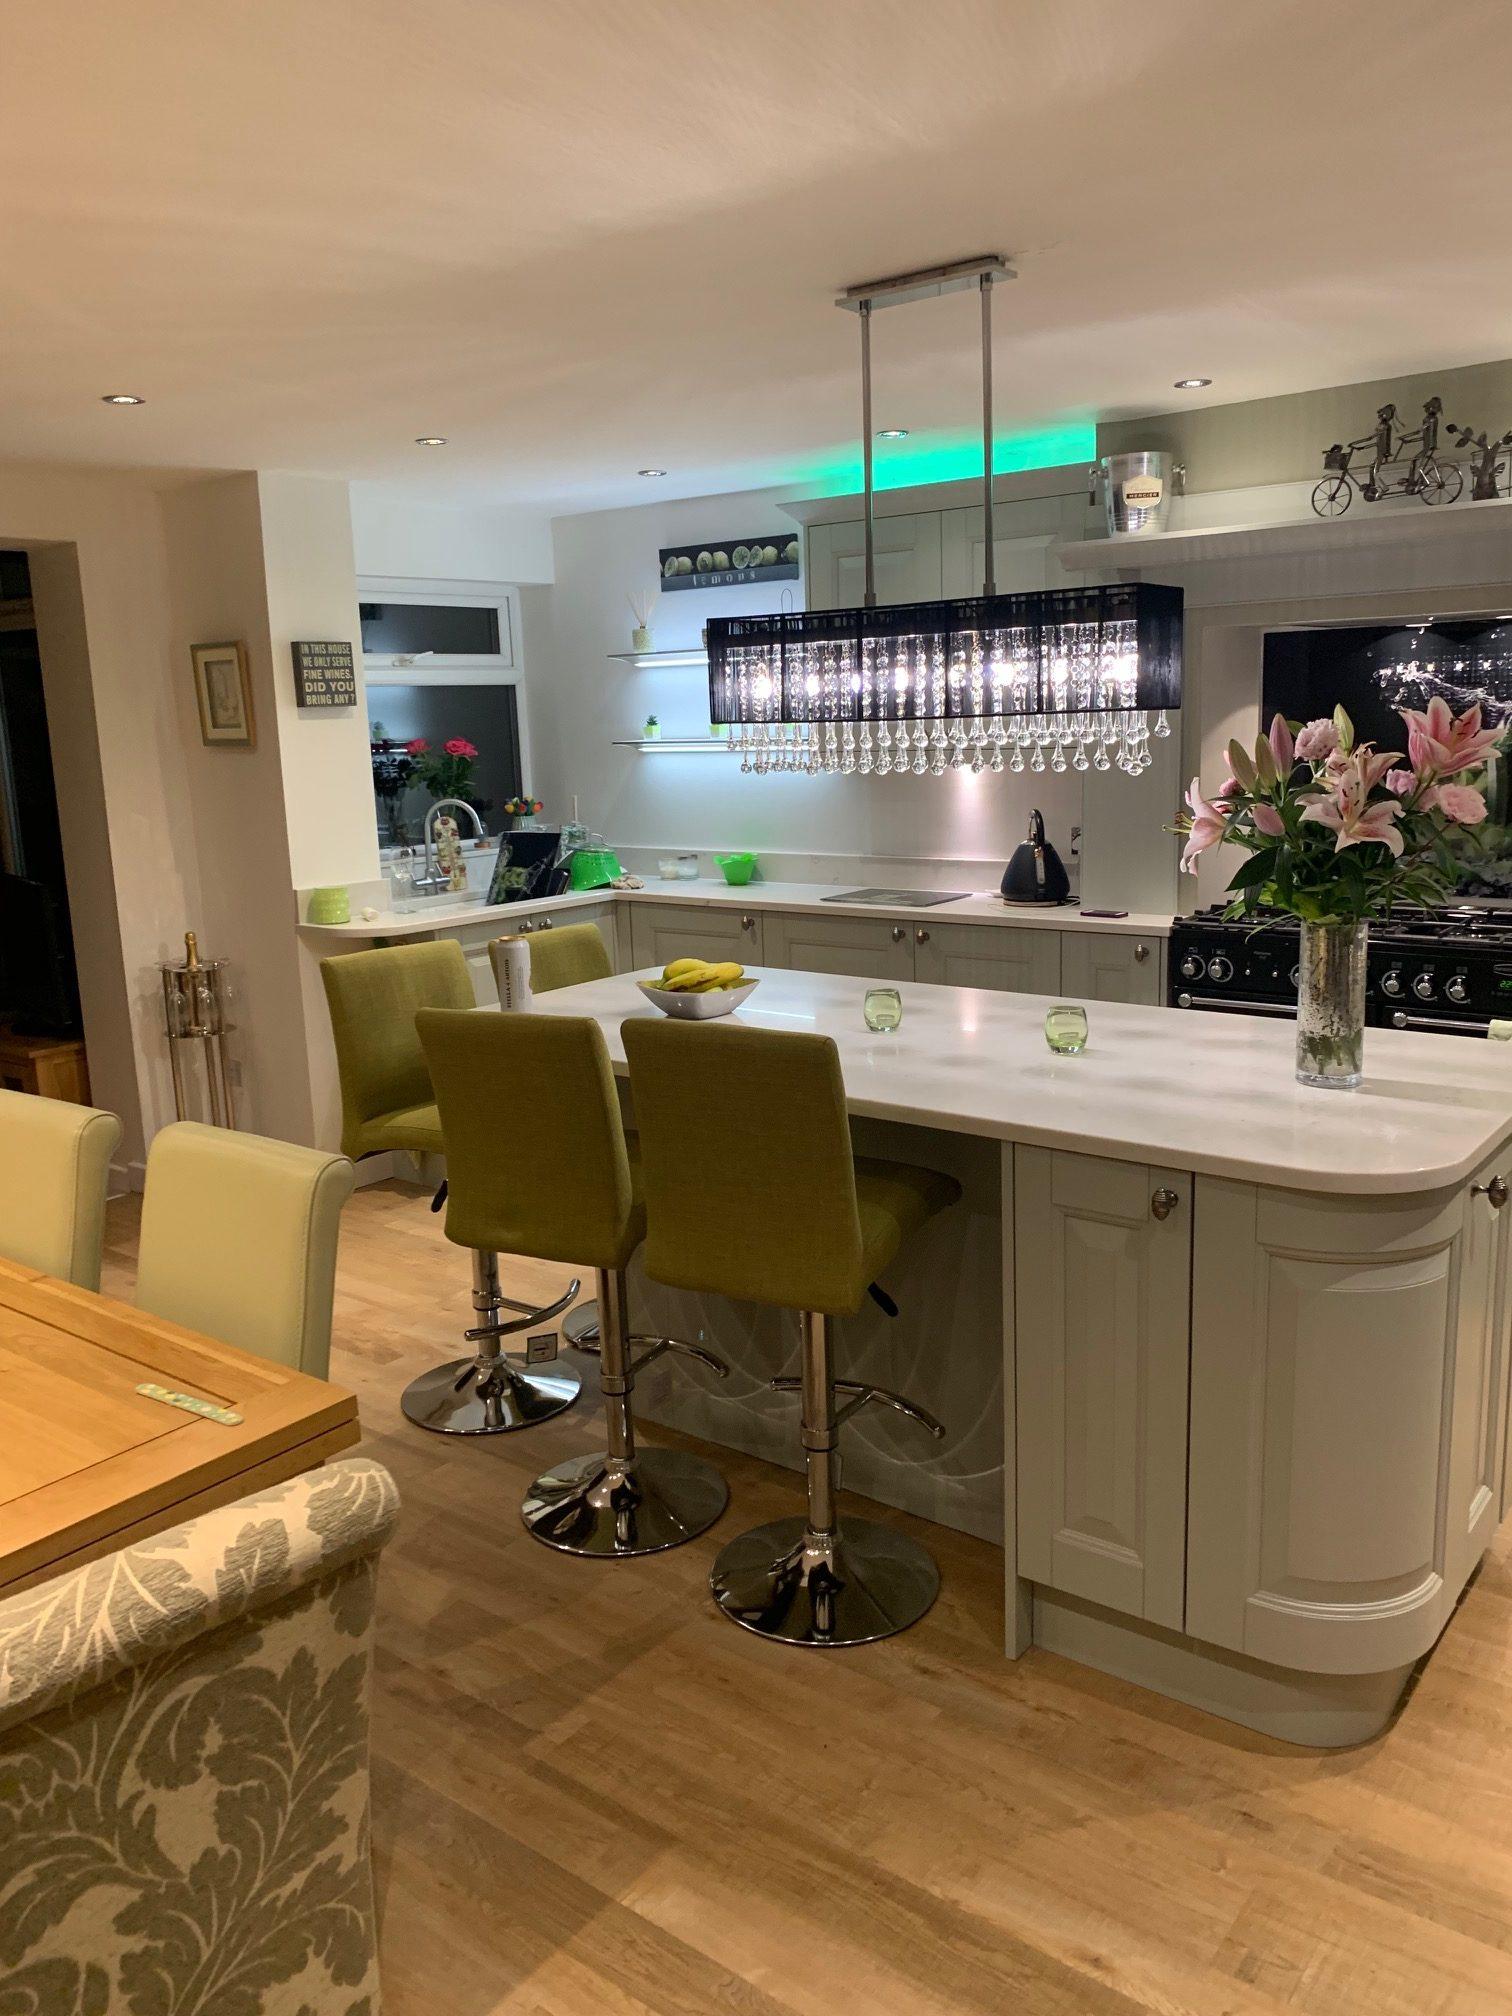 poynton_cheshire_house_refurbishment_2-e1563027230567